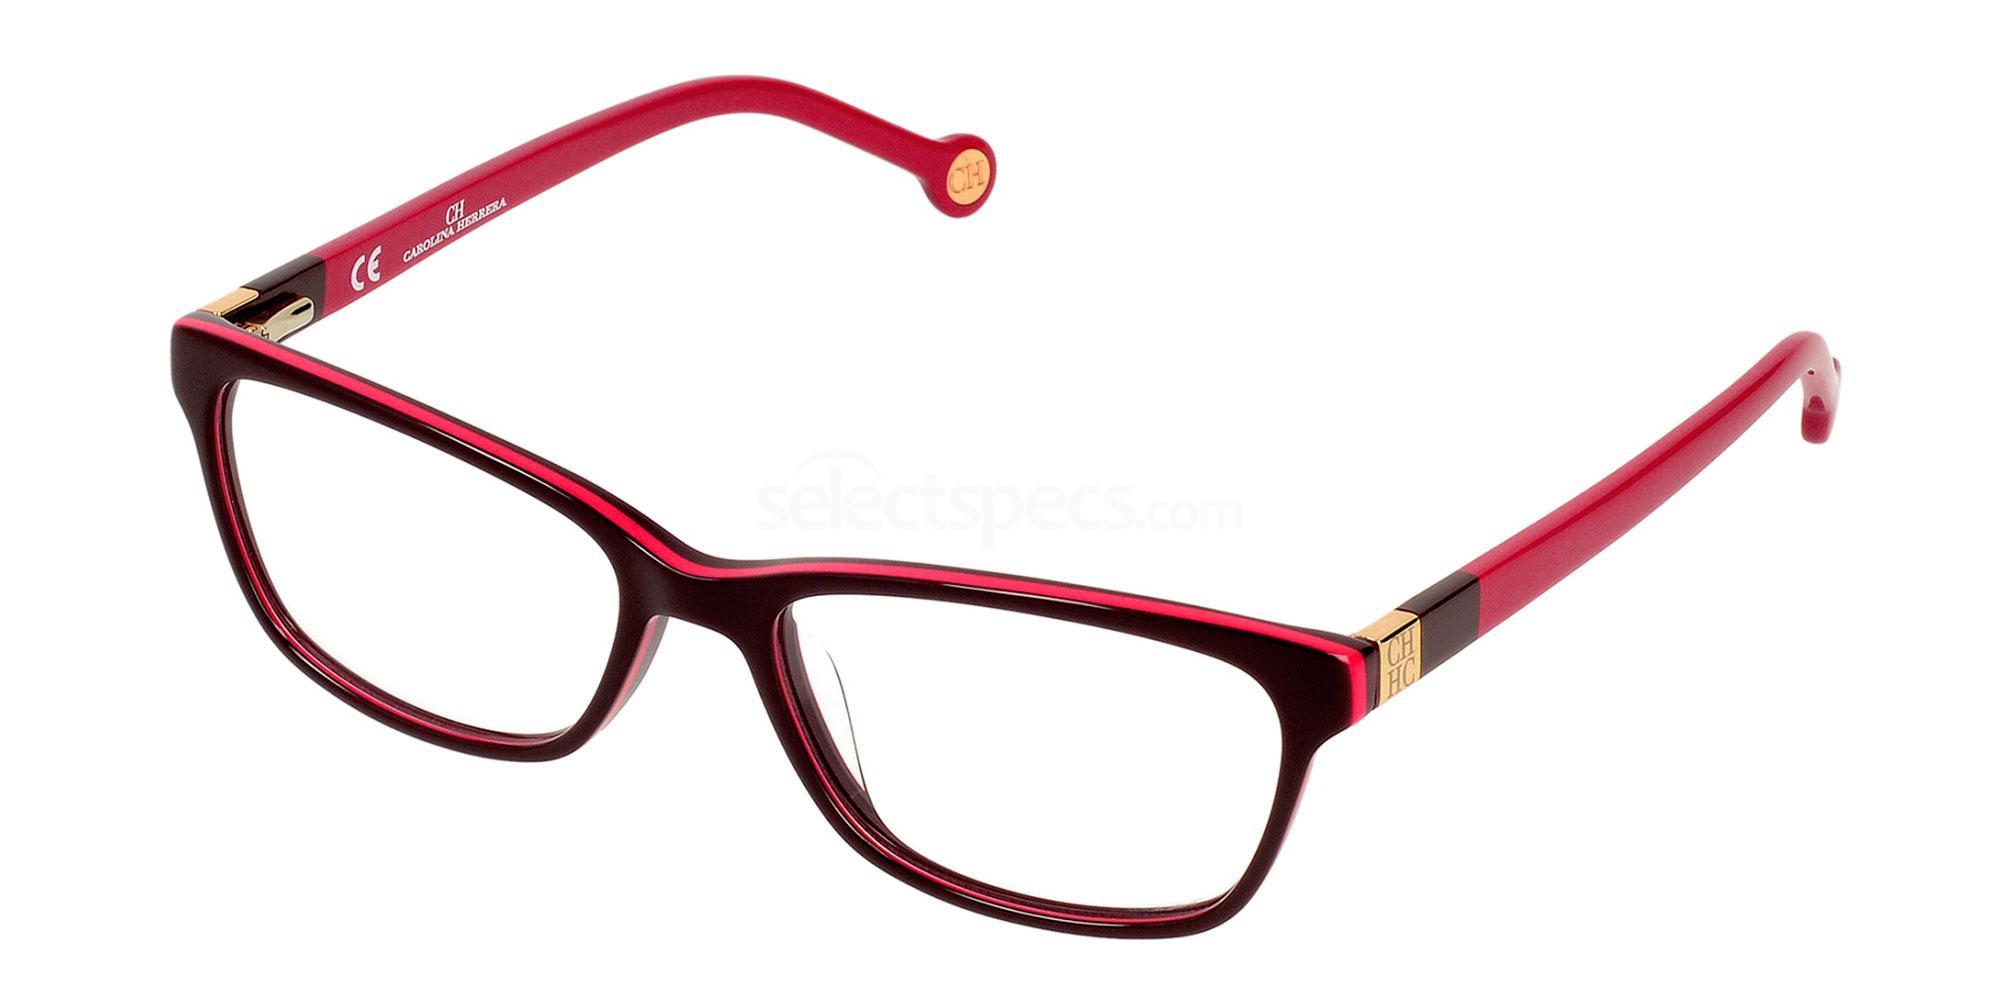 01DJ VHE583 Glasses, CH Carolina Herrera